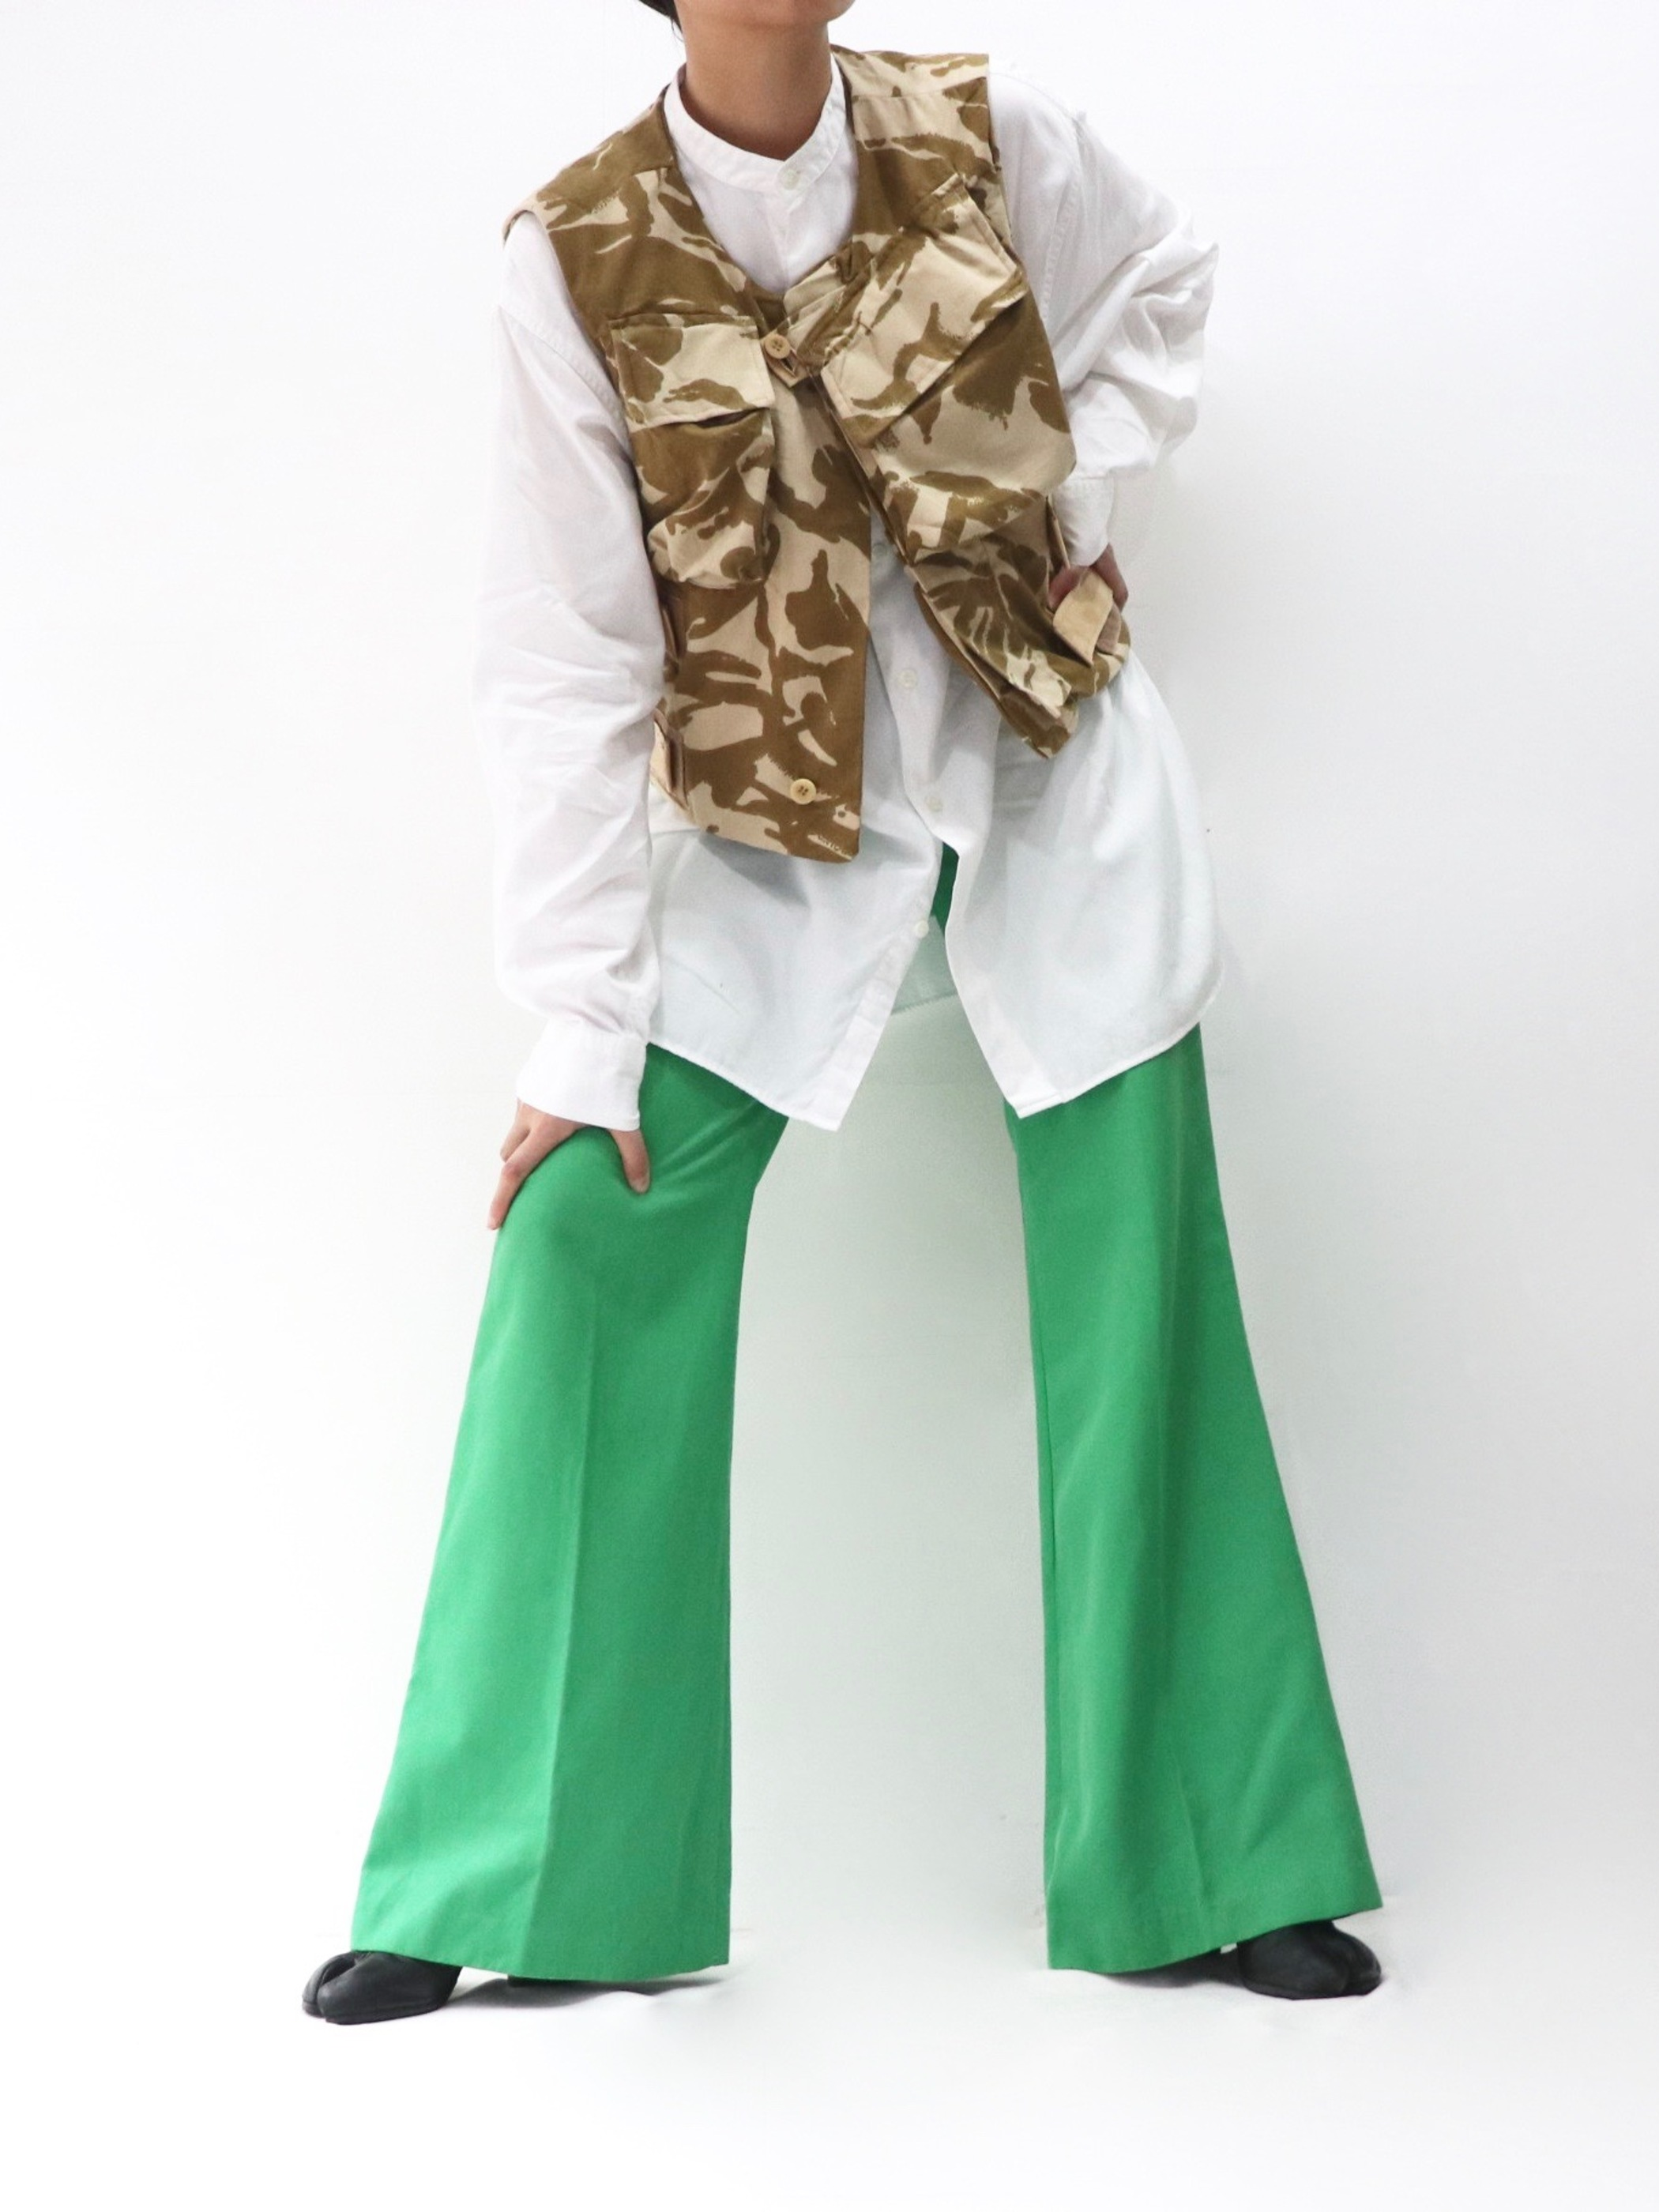 UK army vest (Dead stock)